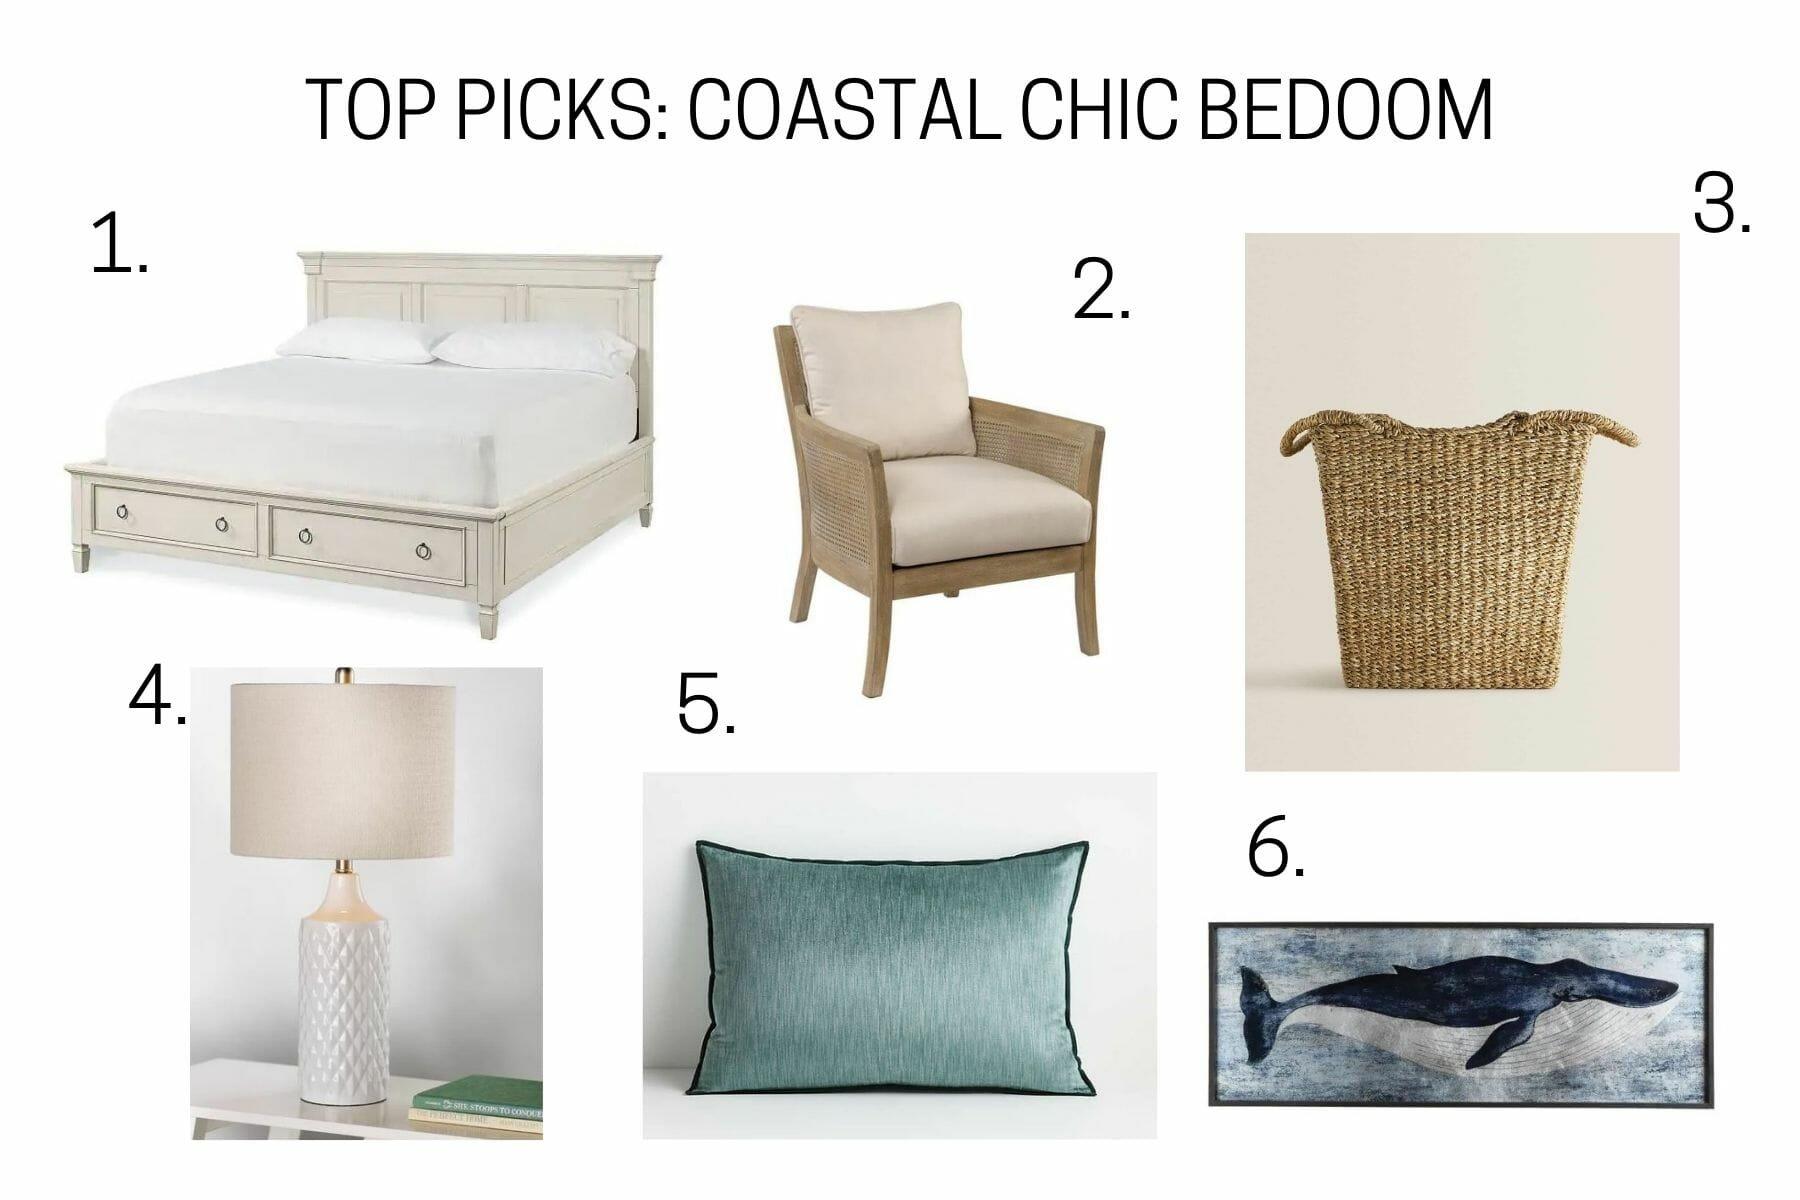 TOP PICKS COASTAL CHIC BEDOOM